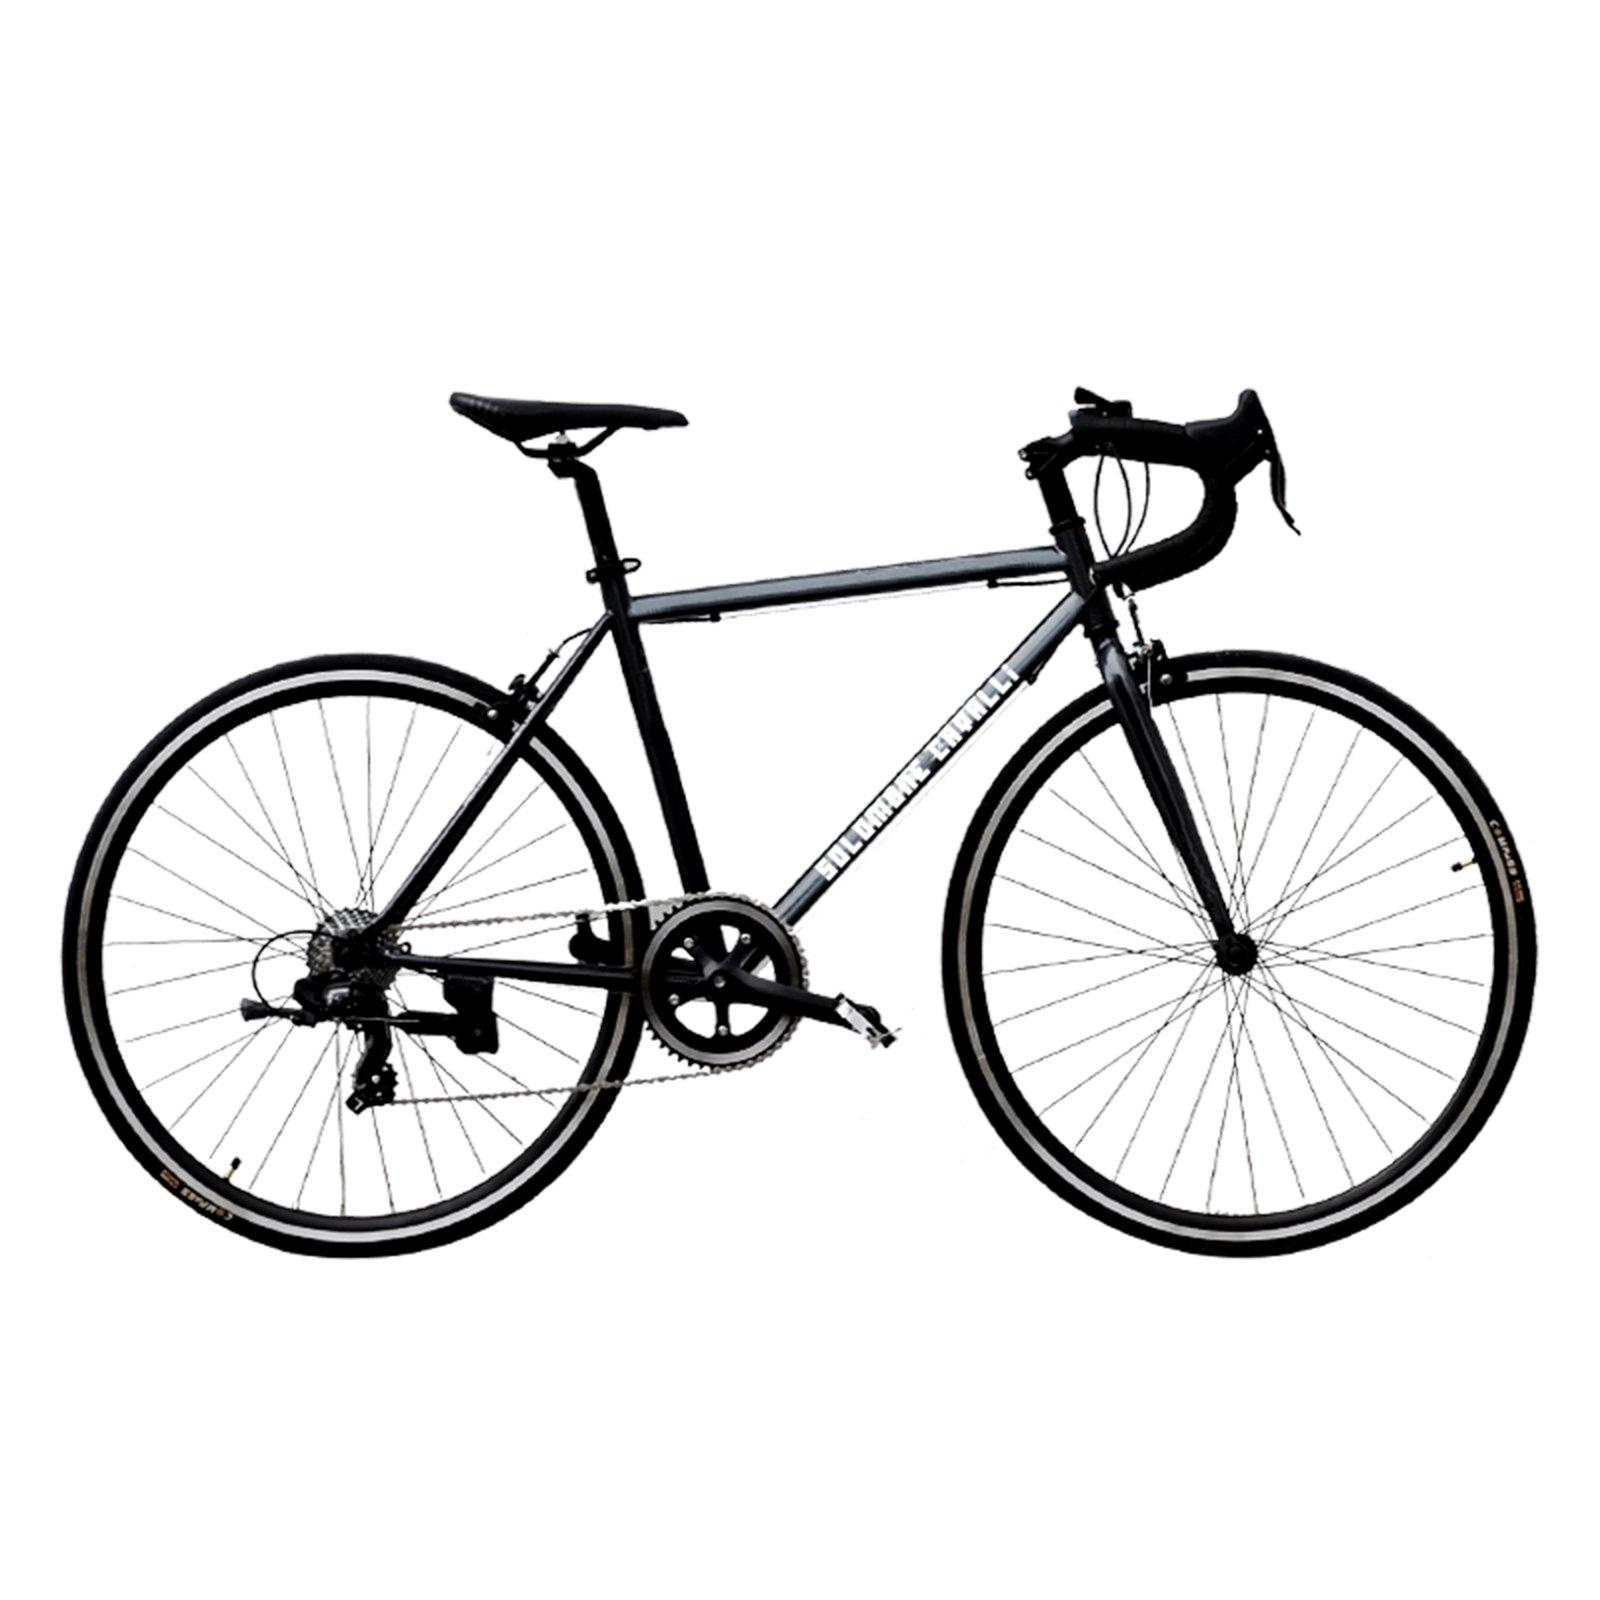 Solomone Cavalli Lightweight Classic Sports 8 Speed 700C Medium Road Bicycle Bike w/Shimano Derailleur by Solomone Cavalli (Image #4)